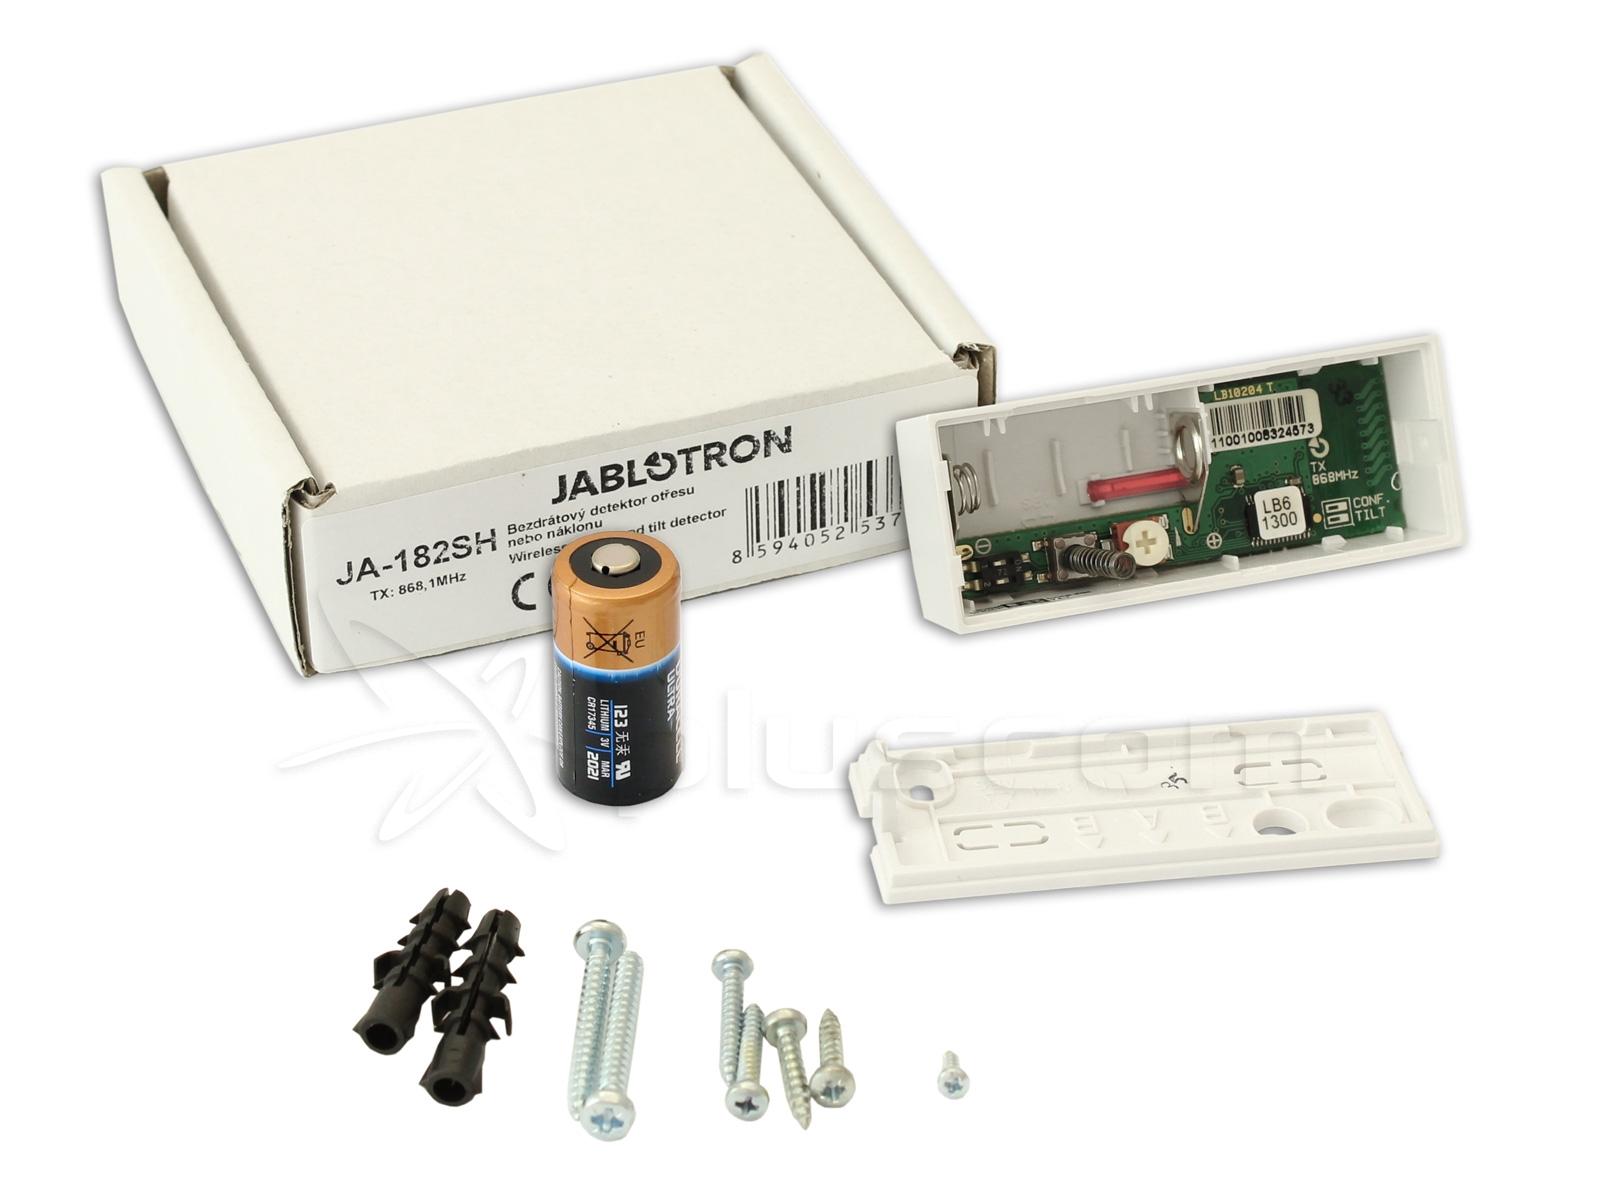 Jablotron Wireless Alarm System